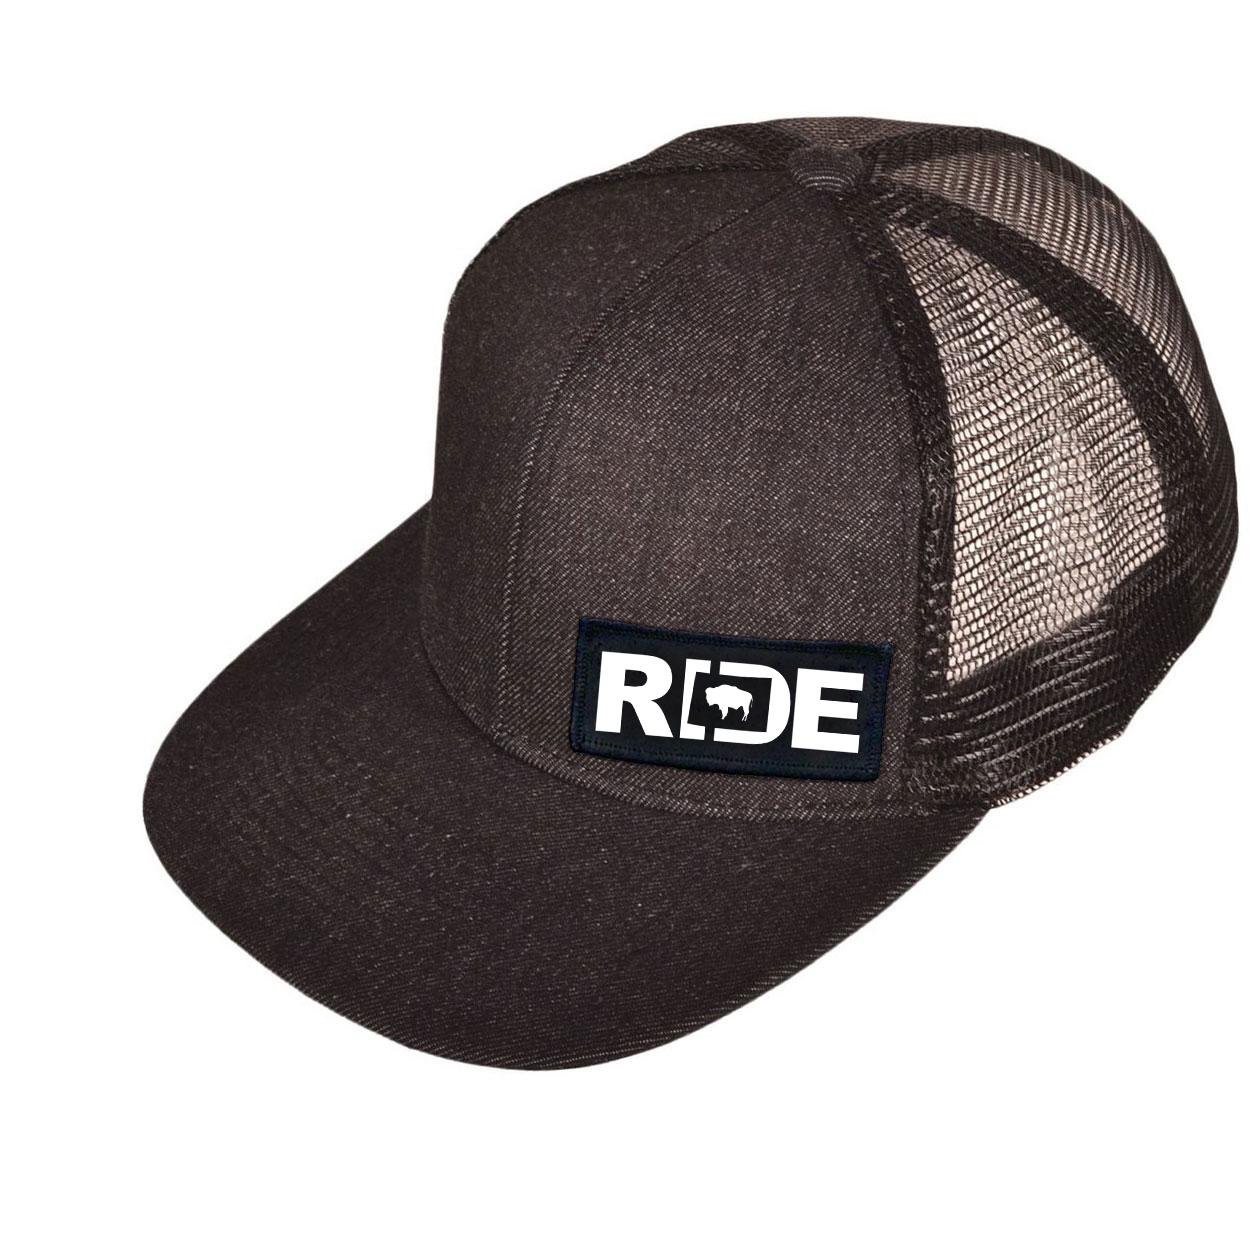 Ride Wyoming Night Out Woven Patch Snapback Flat Brim Hat Black Denim (White Logo)